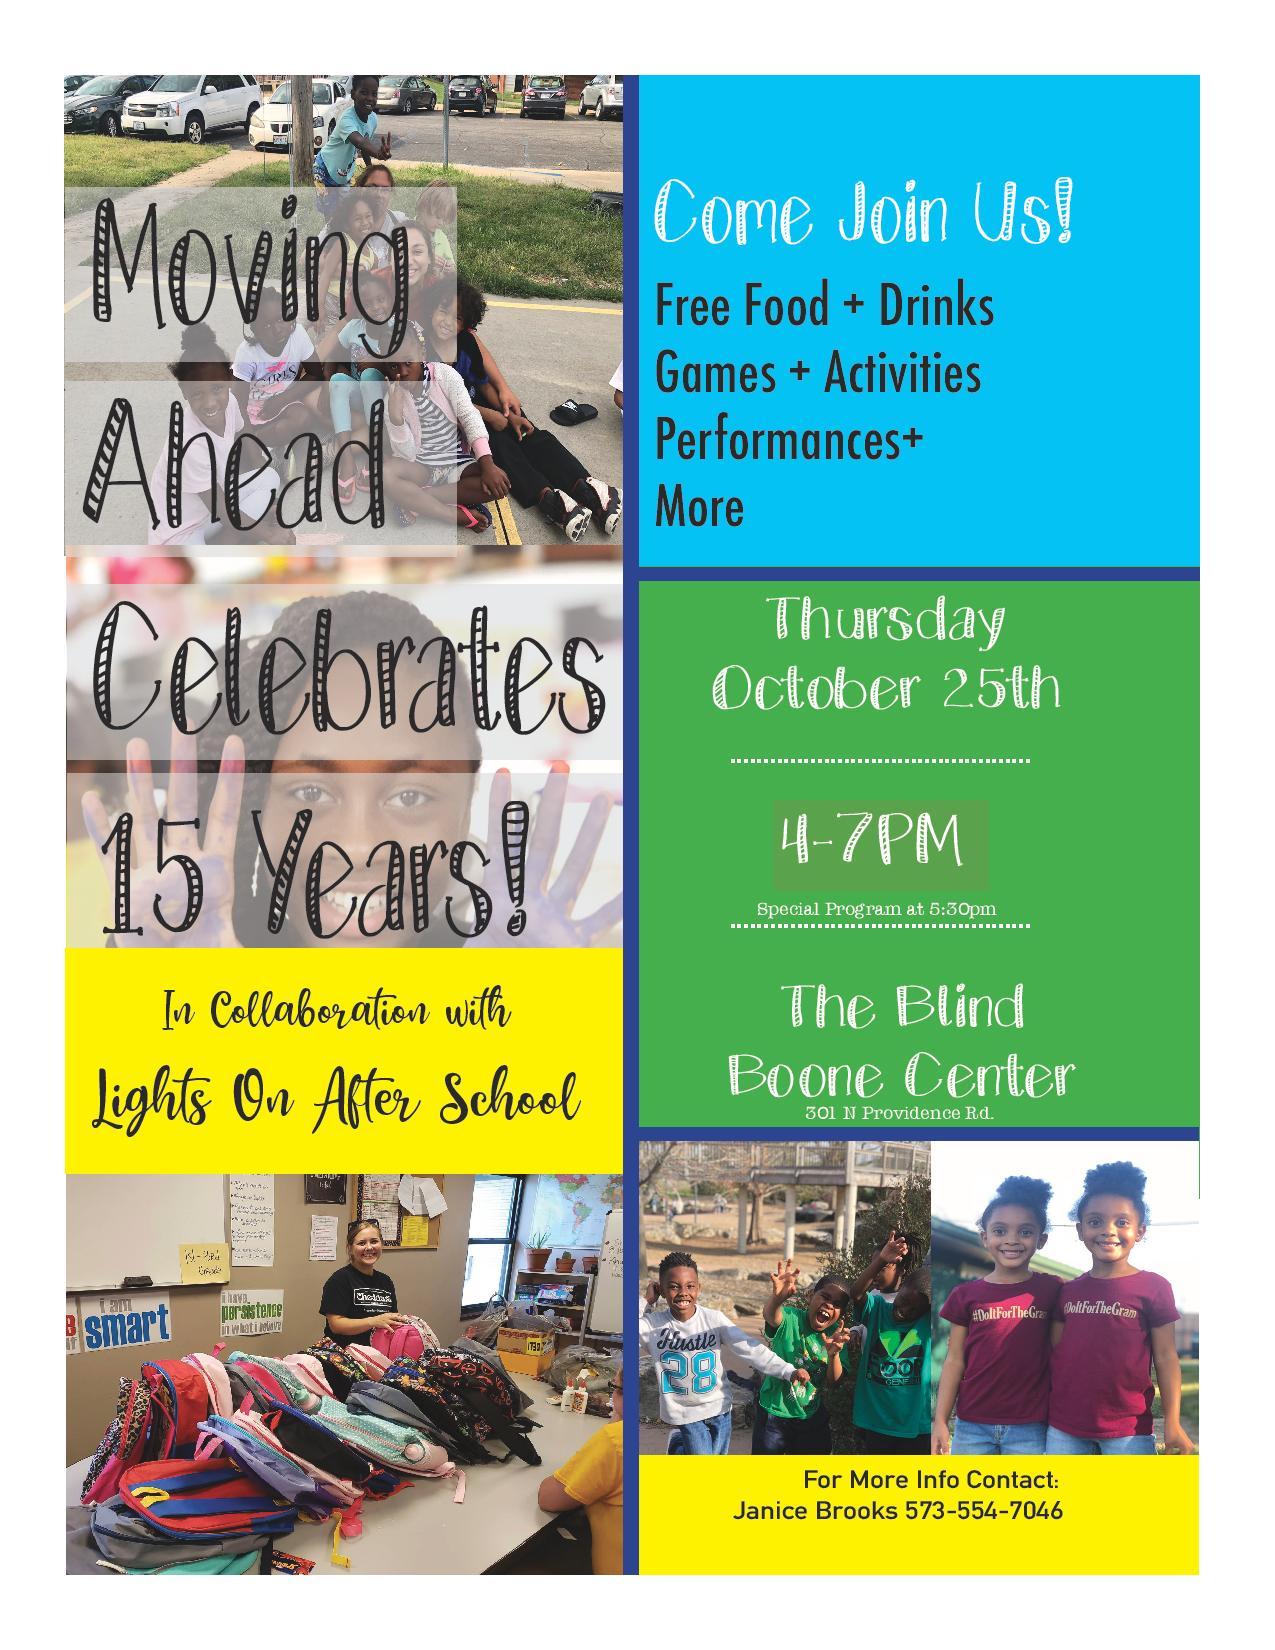 CHA Moving Ahead Program 15th Anniversary Celebration